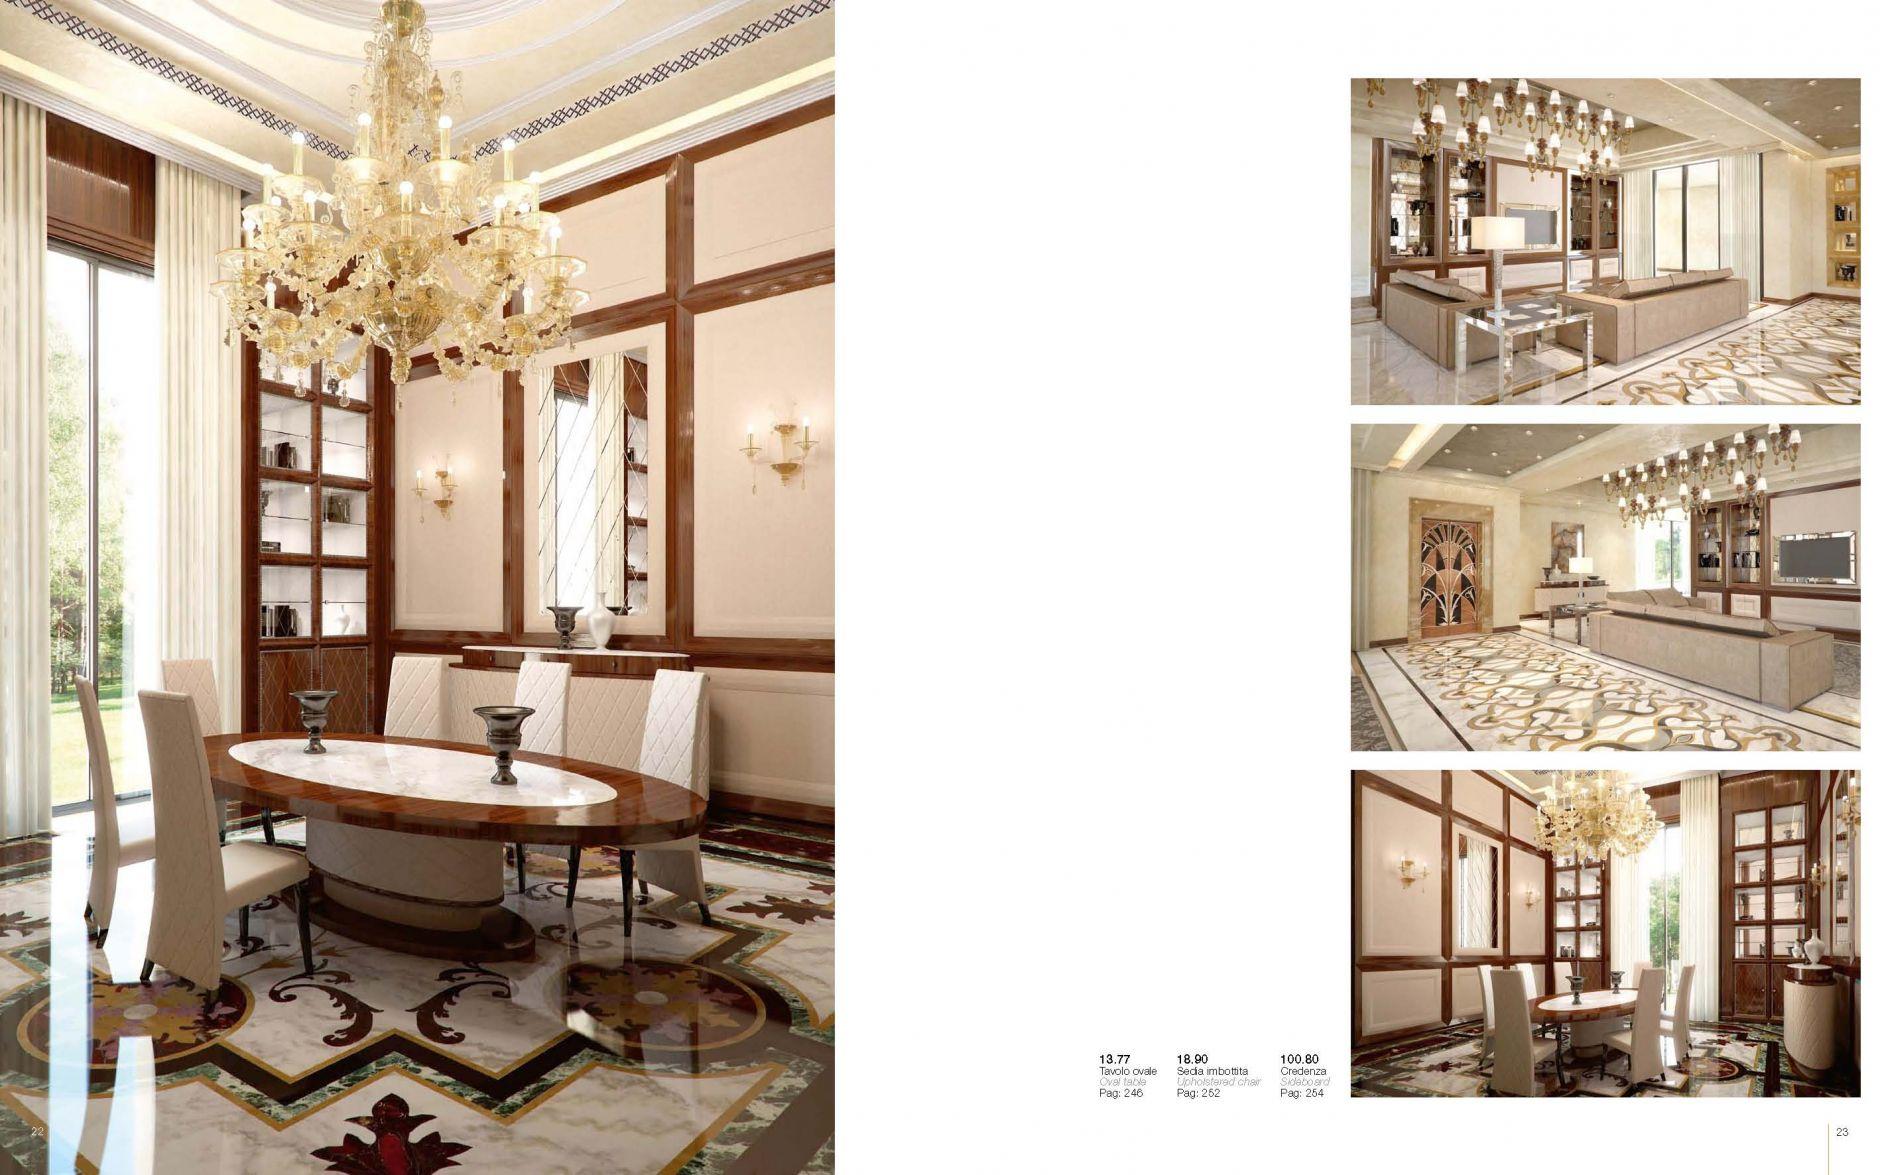 Credenza La Dolce Vita : Luxurious furniture dining room mino dolce vita seriesfurniture